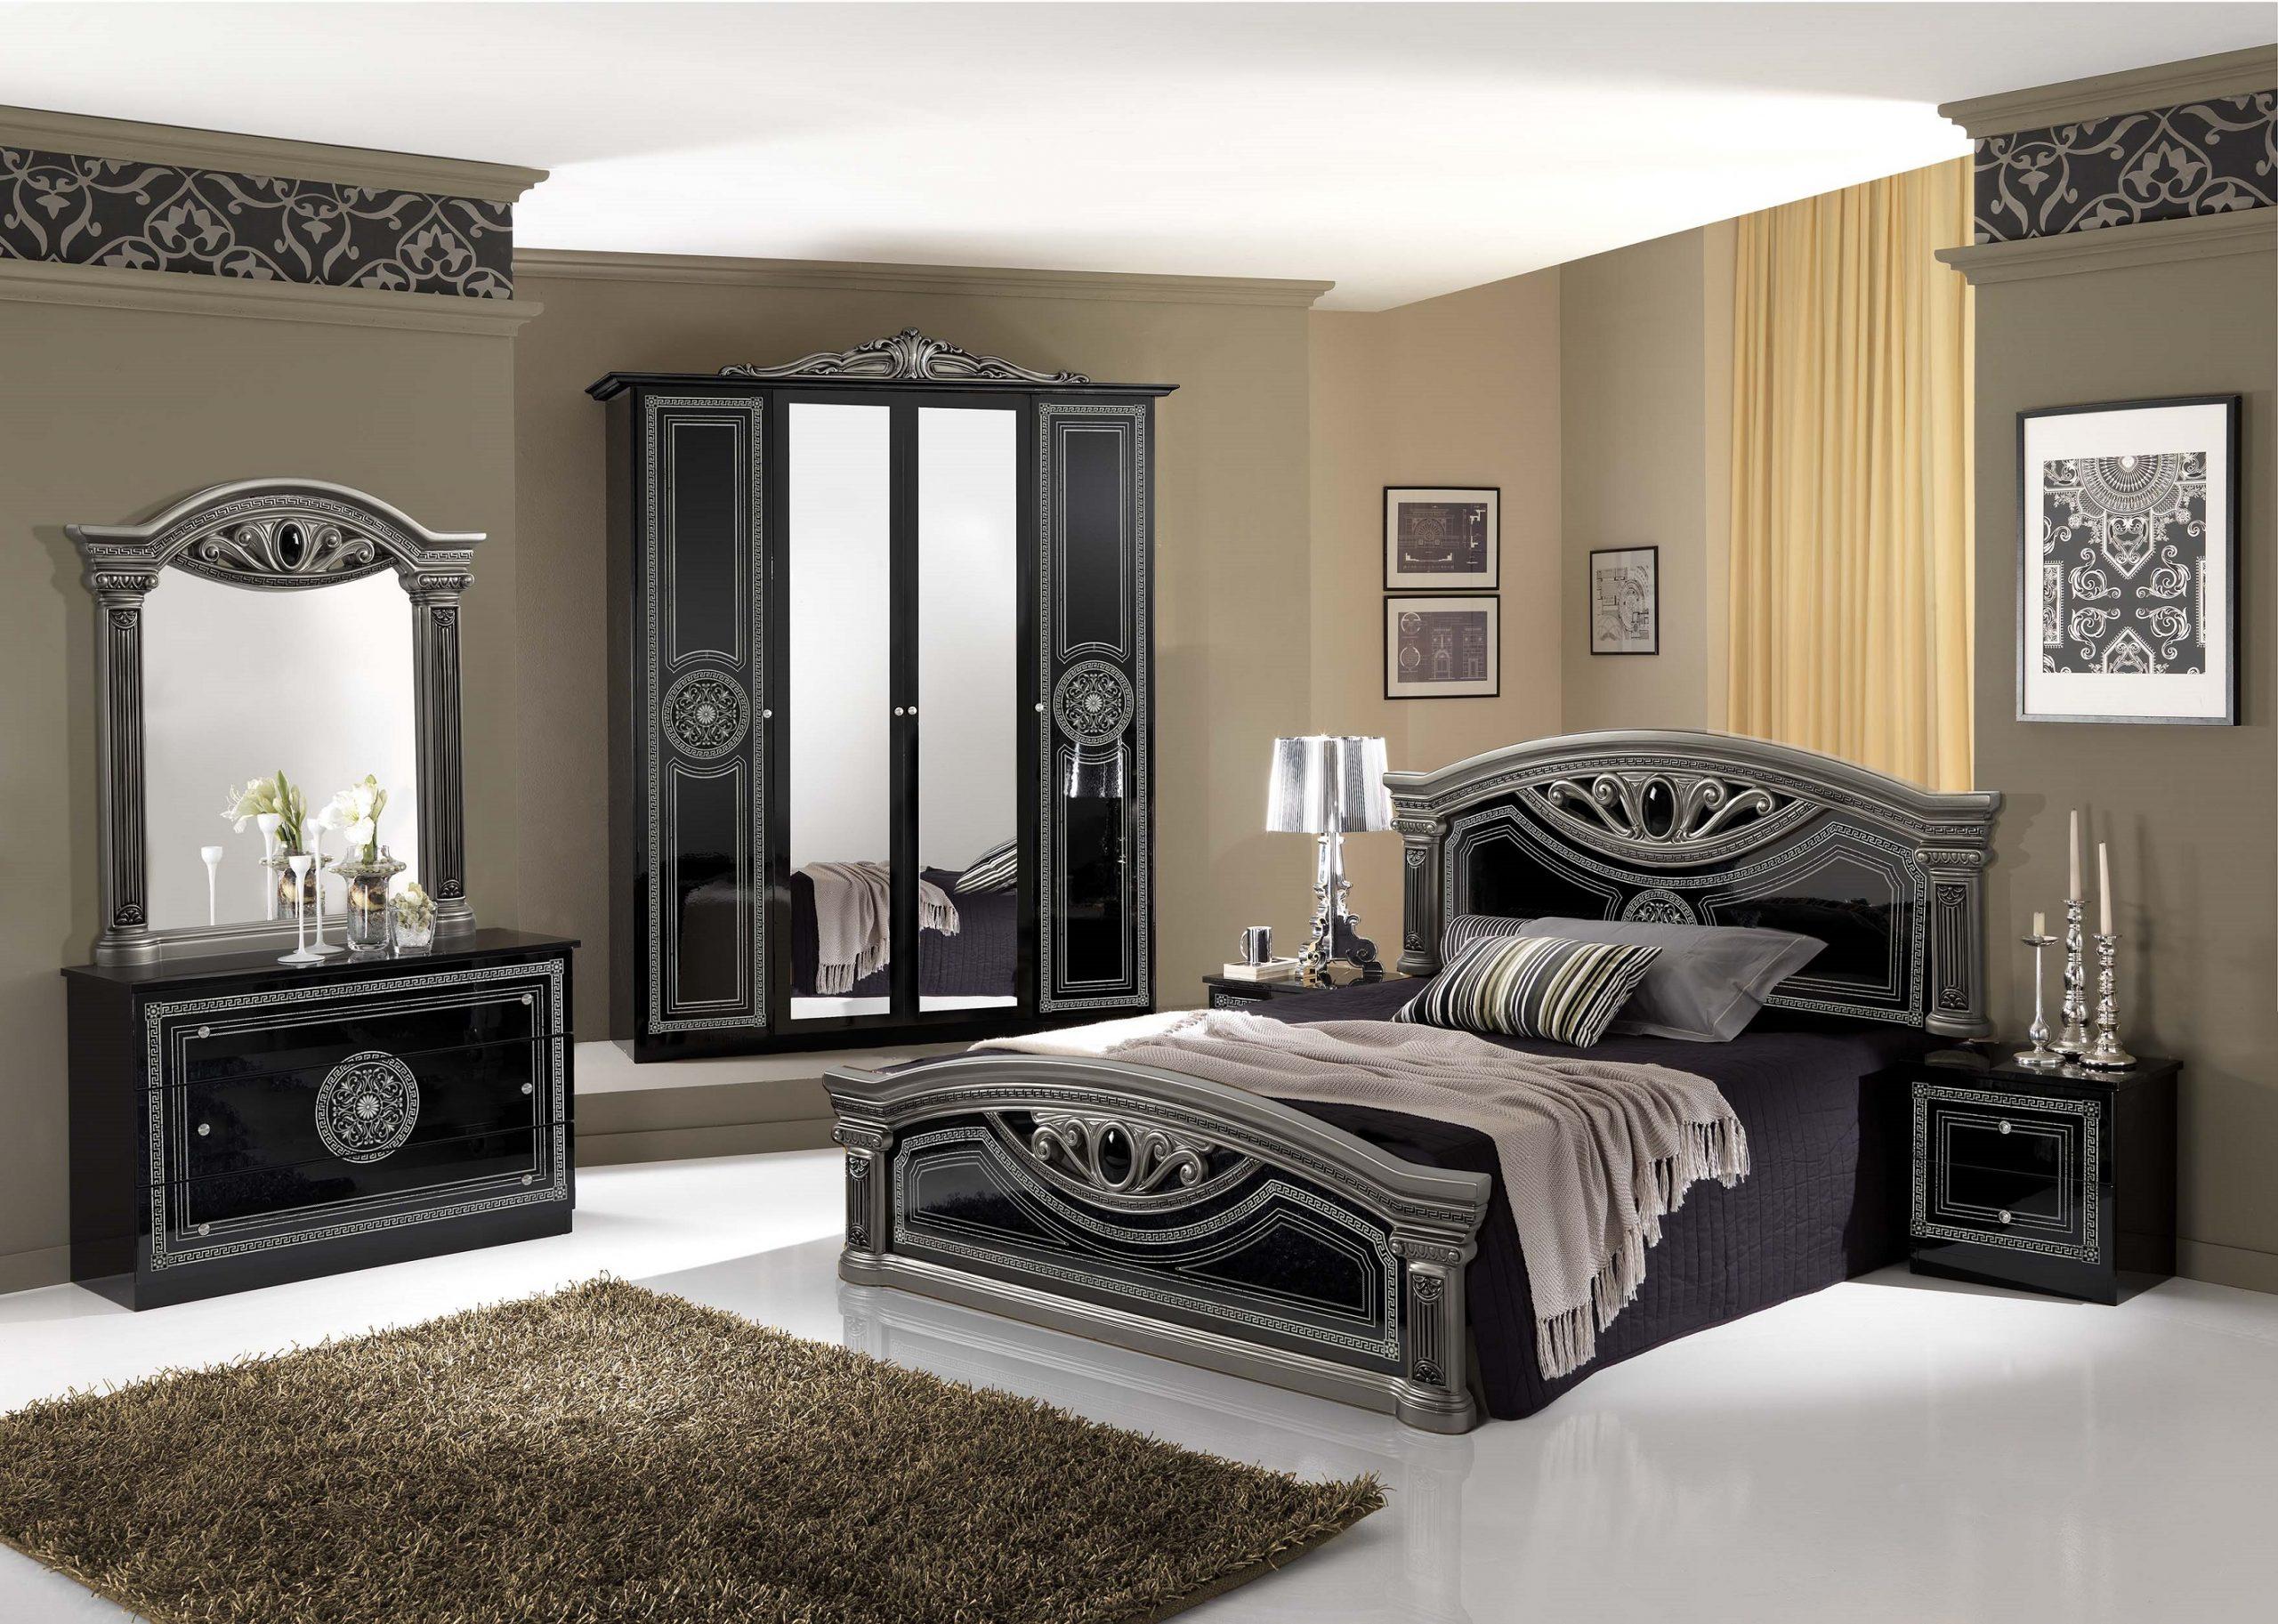 Full Size of Schlafzimmer Landhausstil Bett Kaufen Günstig Stuhl Kommode Günstige Komplett Kronleuchter Kommoden Stehlampe Günstiges Led Deckenleuchte Set Mit Matratze Schlafzimmer Schlafzimmer Set Günstig